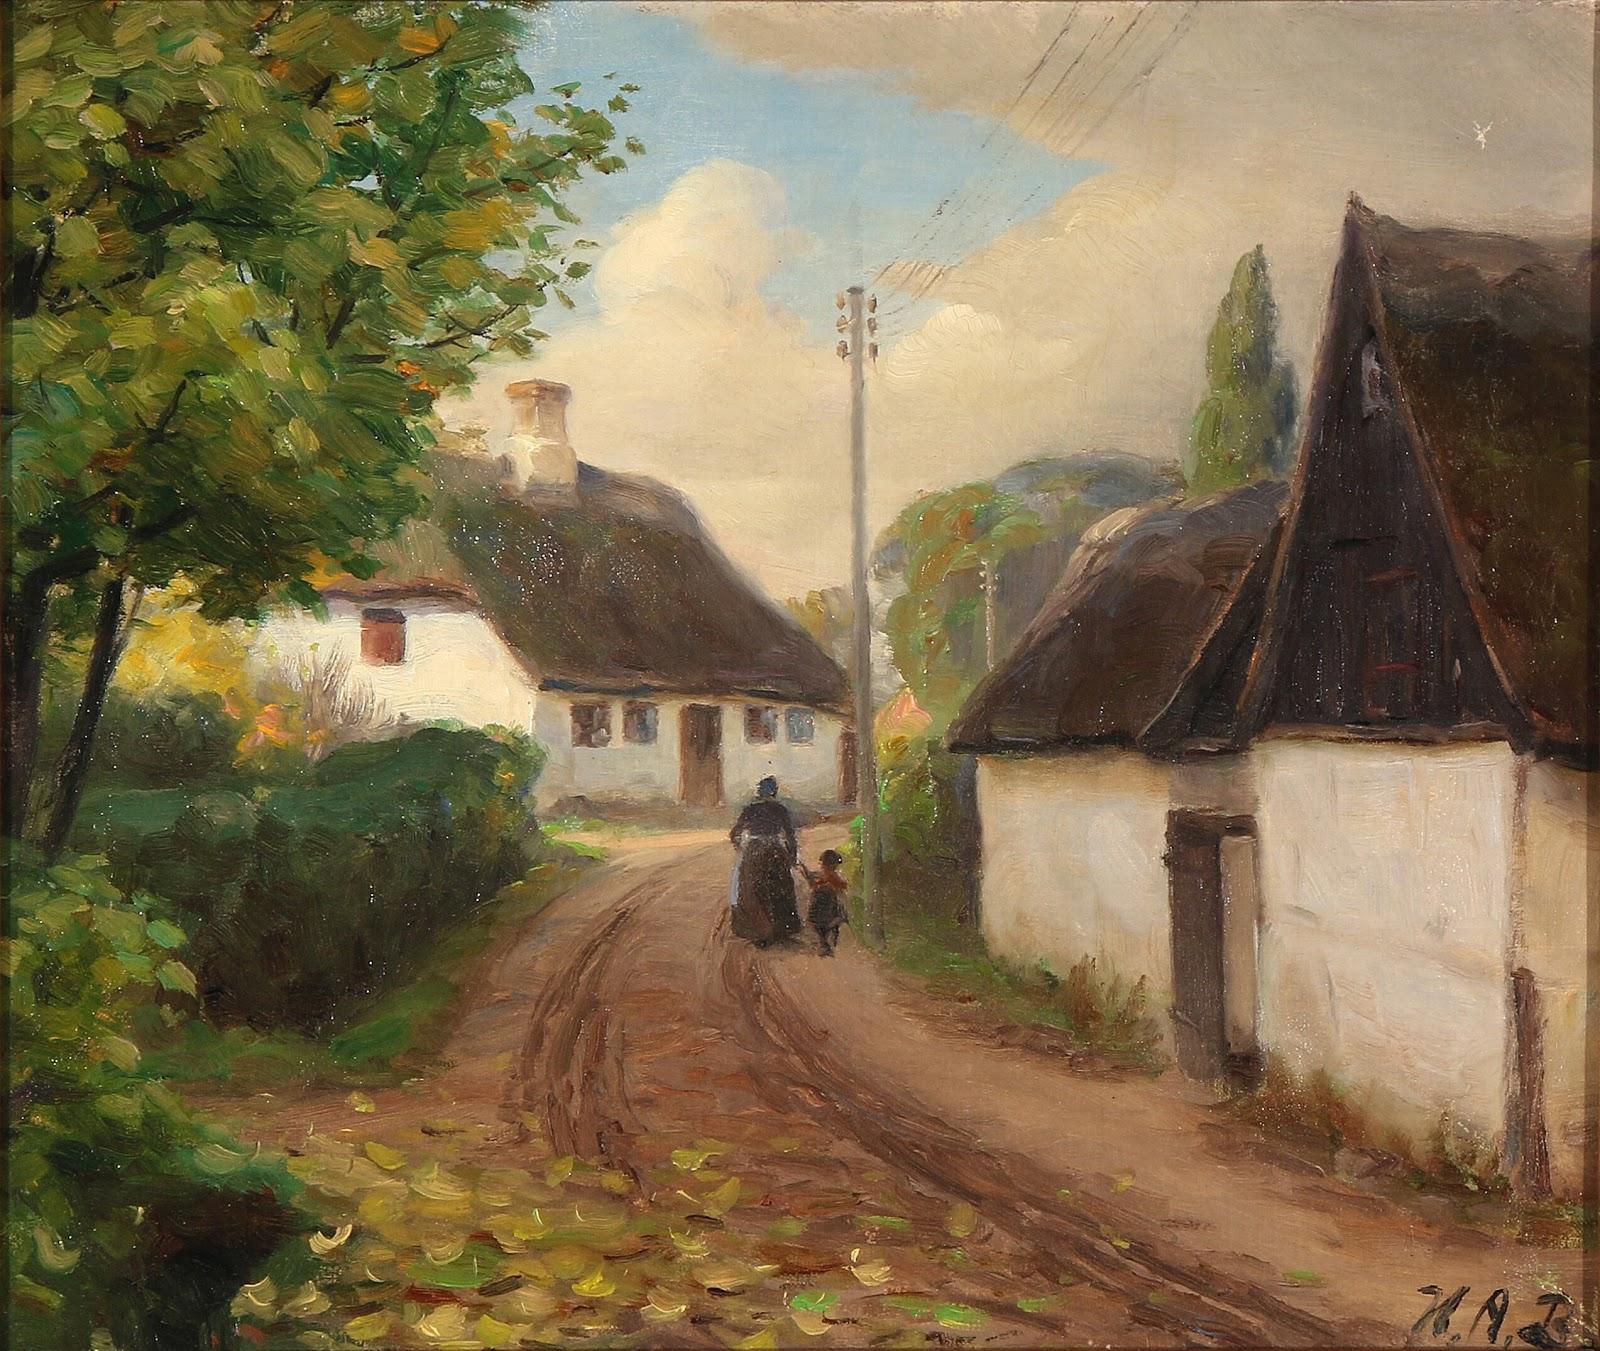 Hans Andersen  rendekilde En landsbygade med en kone og et barn C der g C Ar h C And i h C And